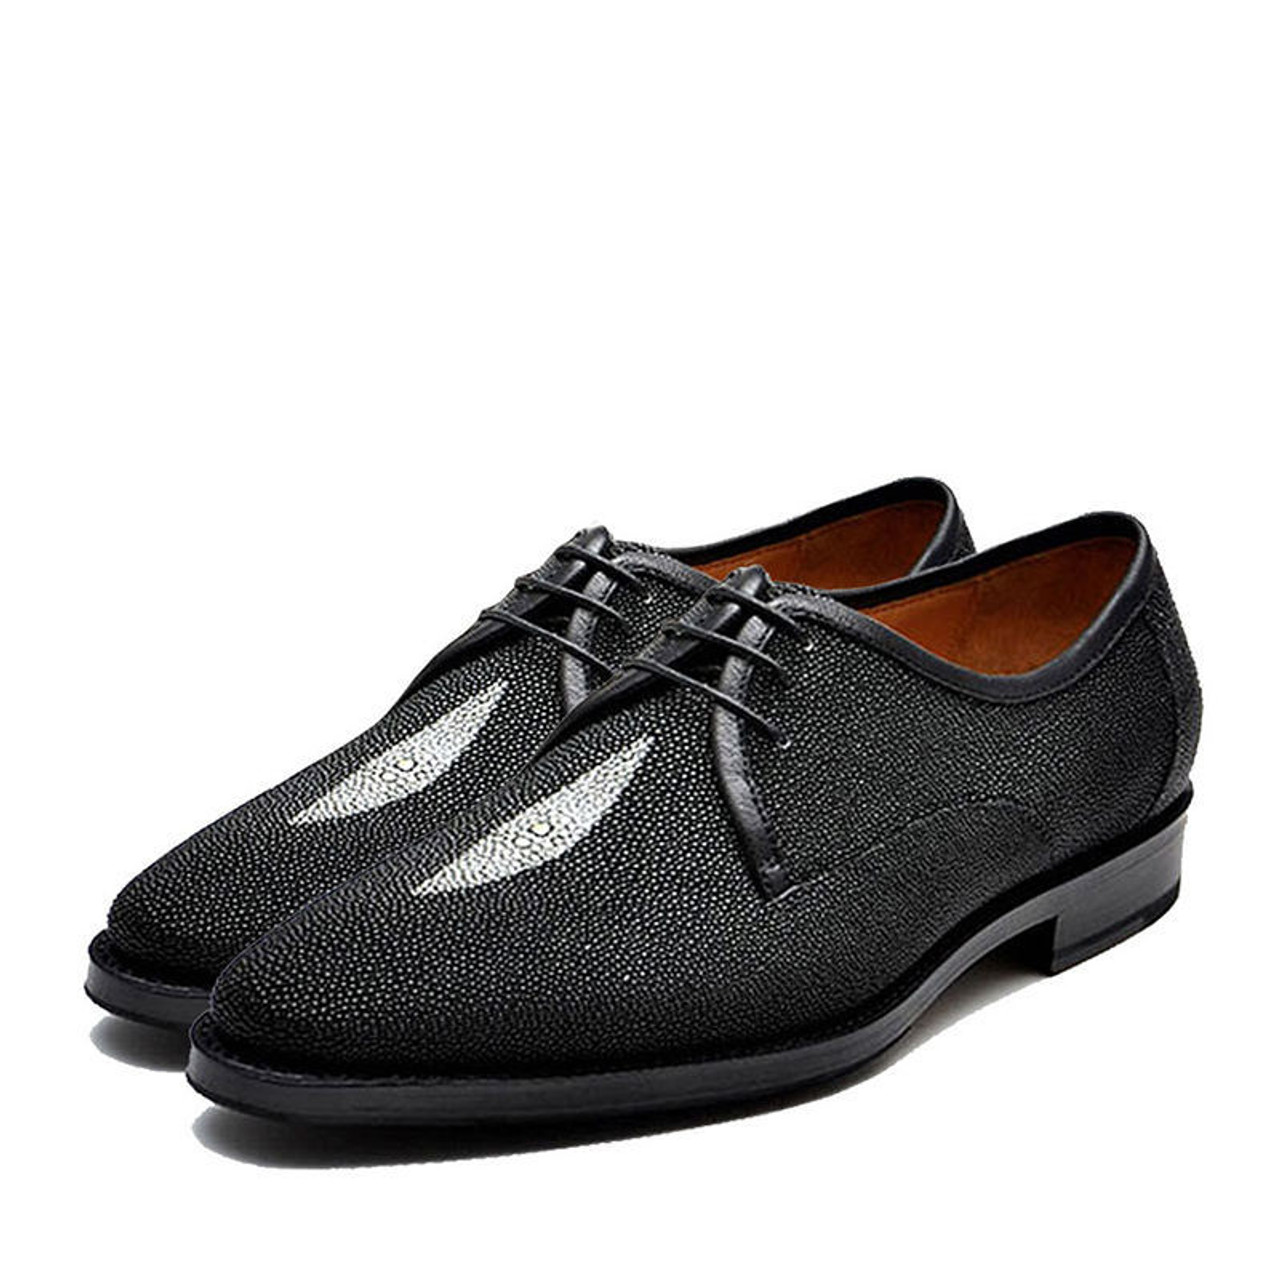 Luxury Shoe Brands |Black Formal Shoes